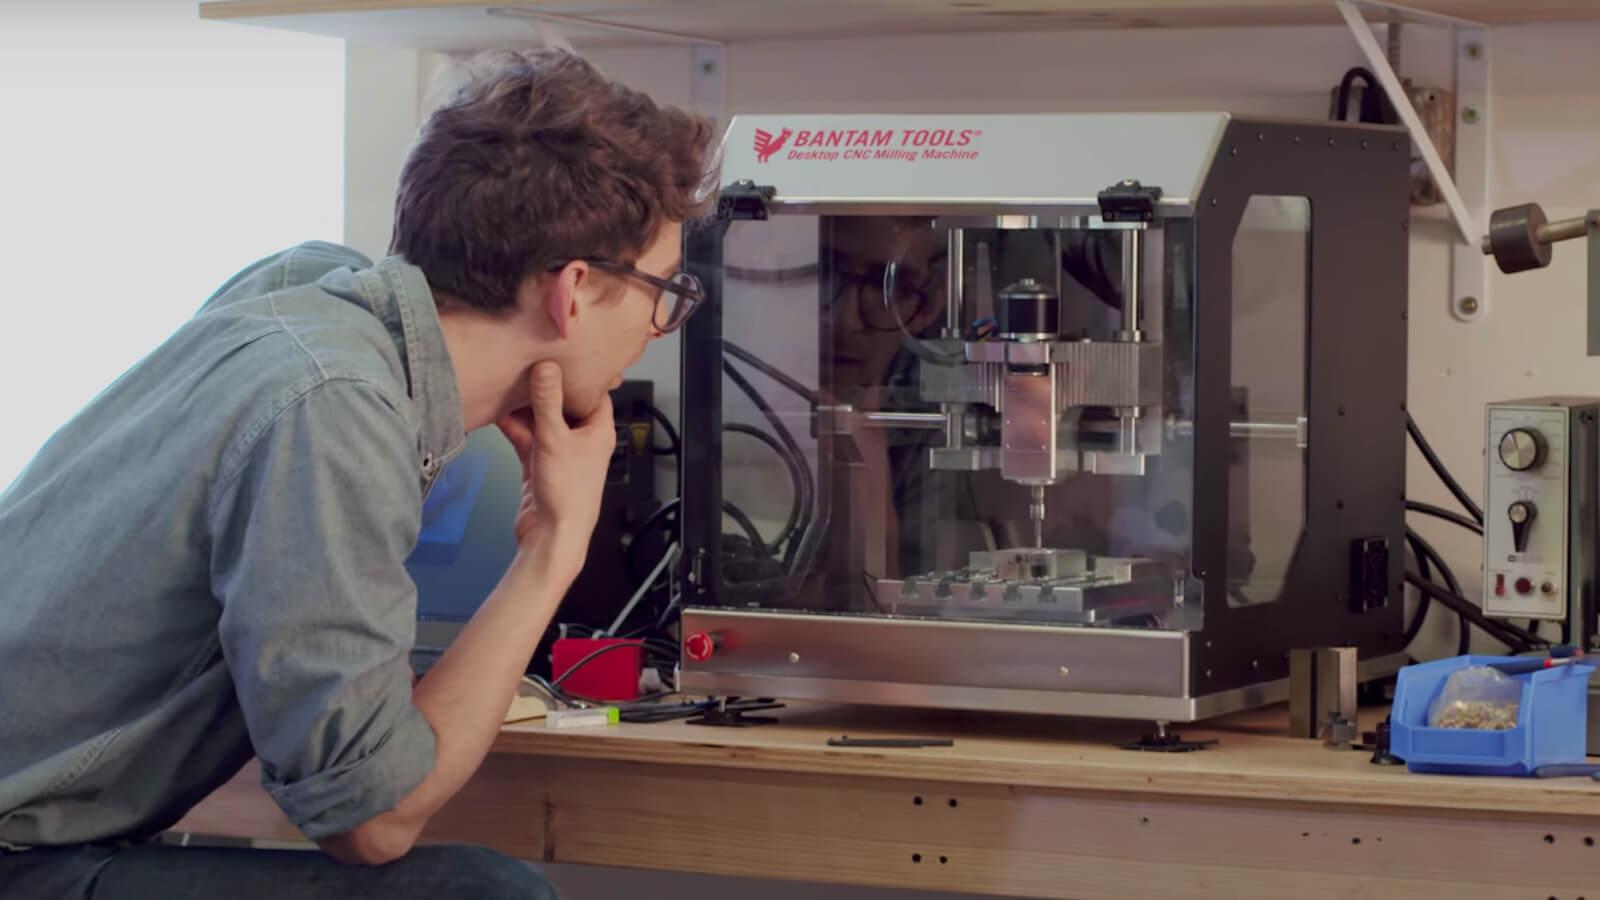 Bantam Tools Desktop CNC Milling Machine Prototyping System